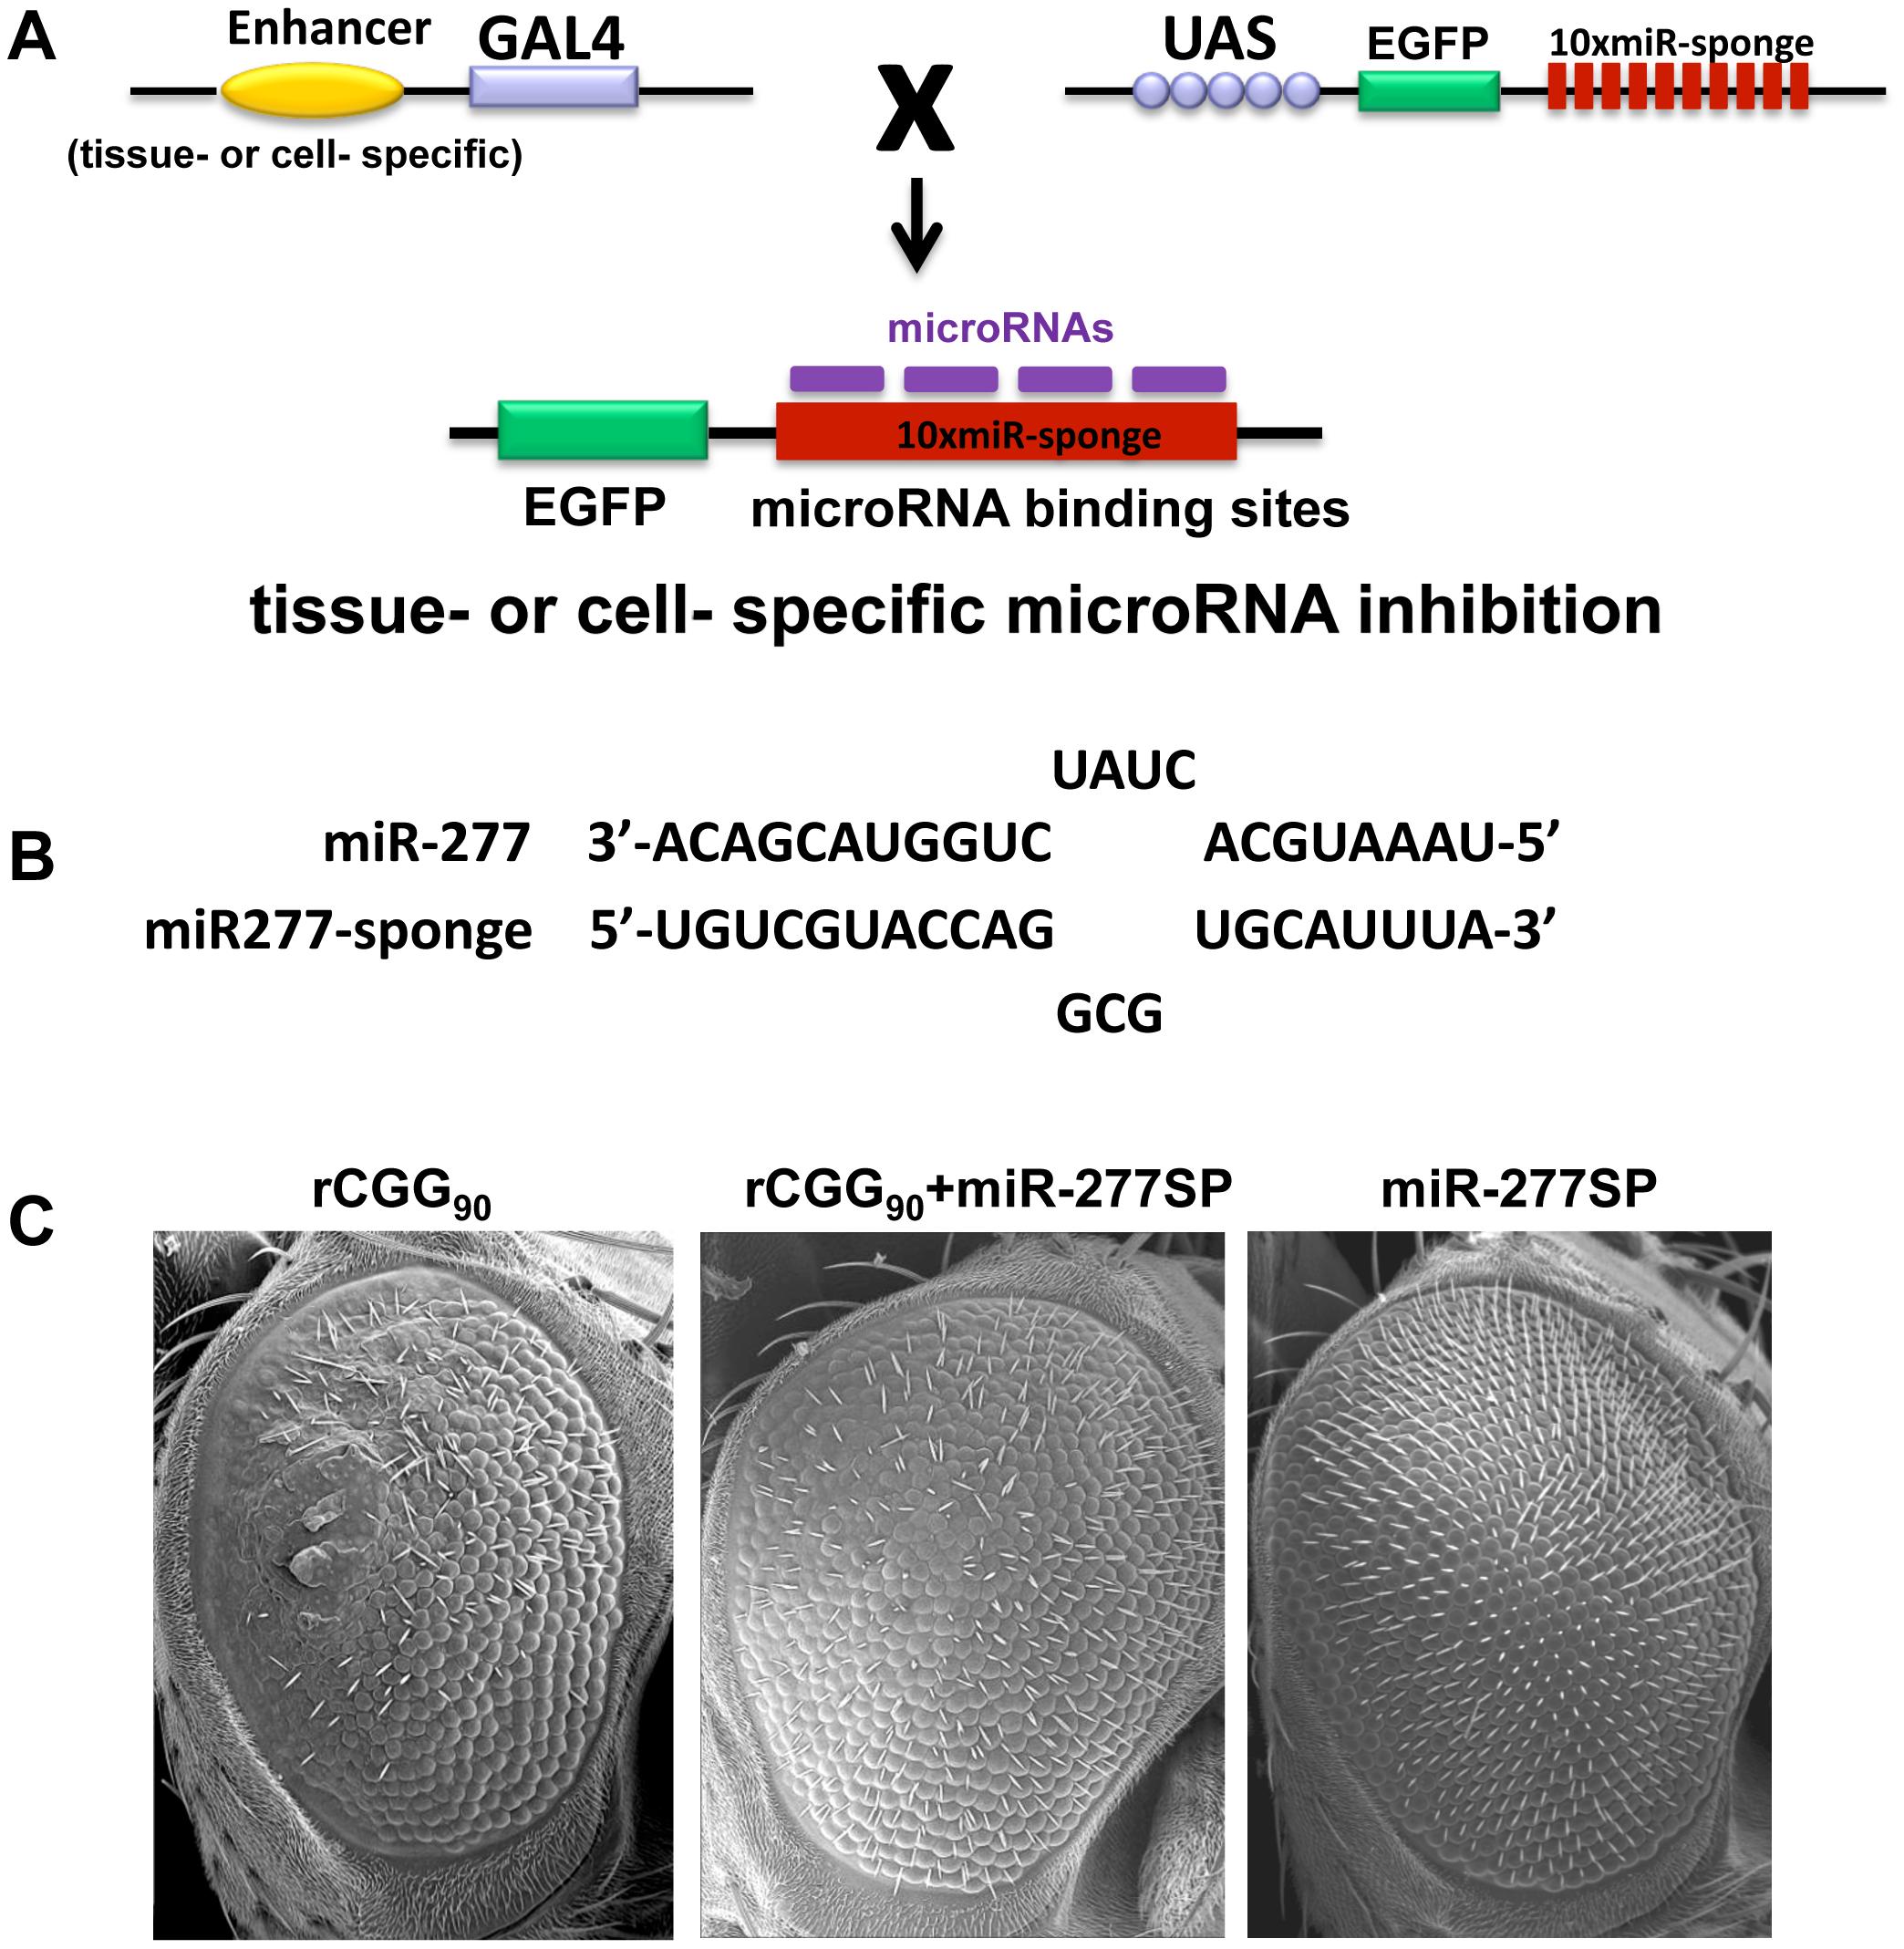 Blocking the activity of miR-277 suppresses rCGG-mediated neurodegeneration.